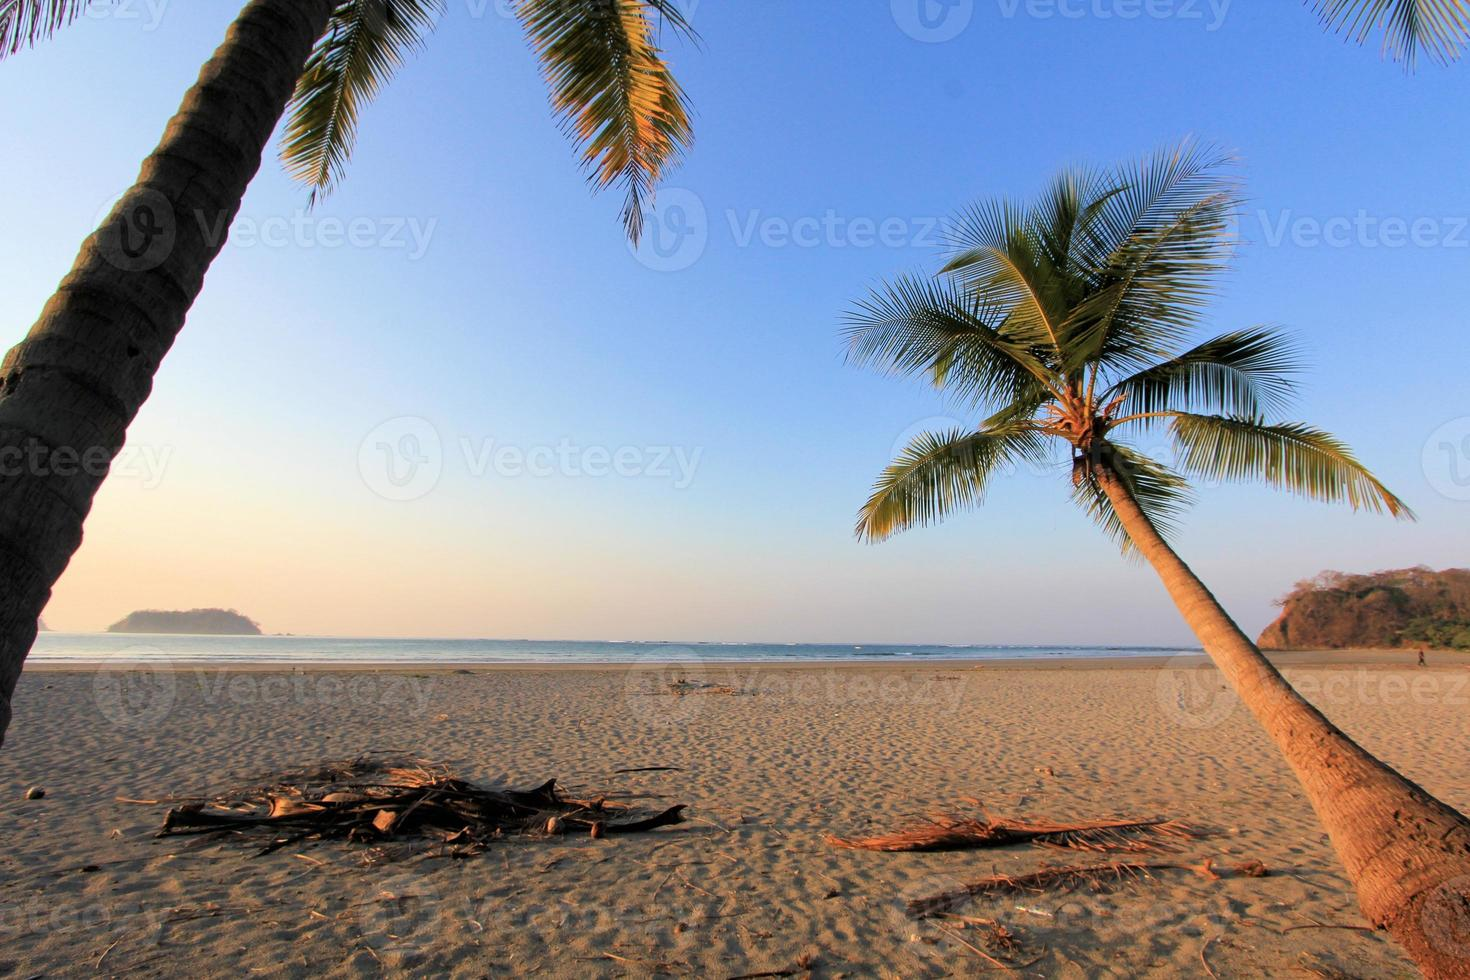 schöner sonnenuntergang mit plam bäumen am samara strand, costa-rica foto